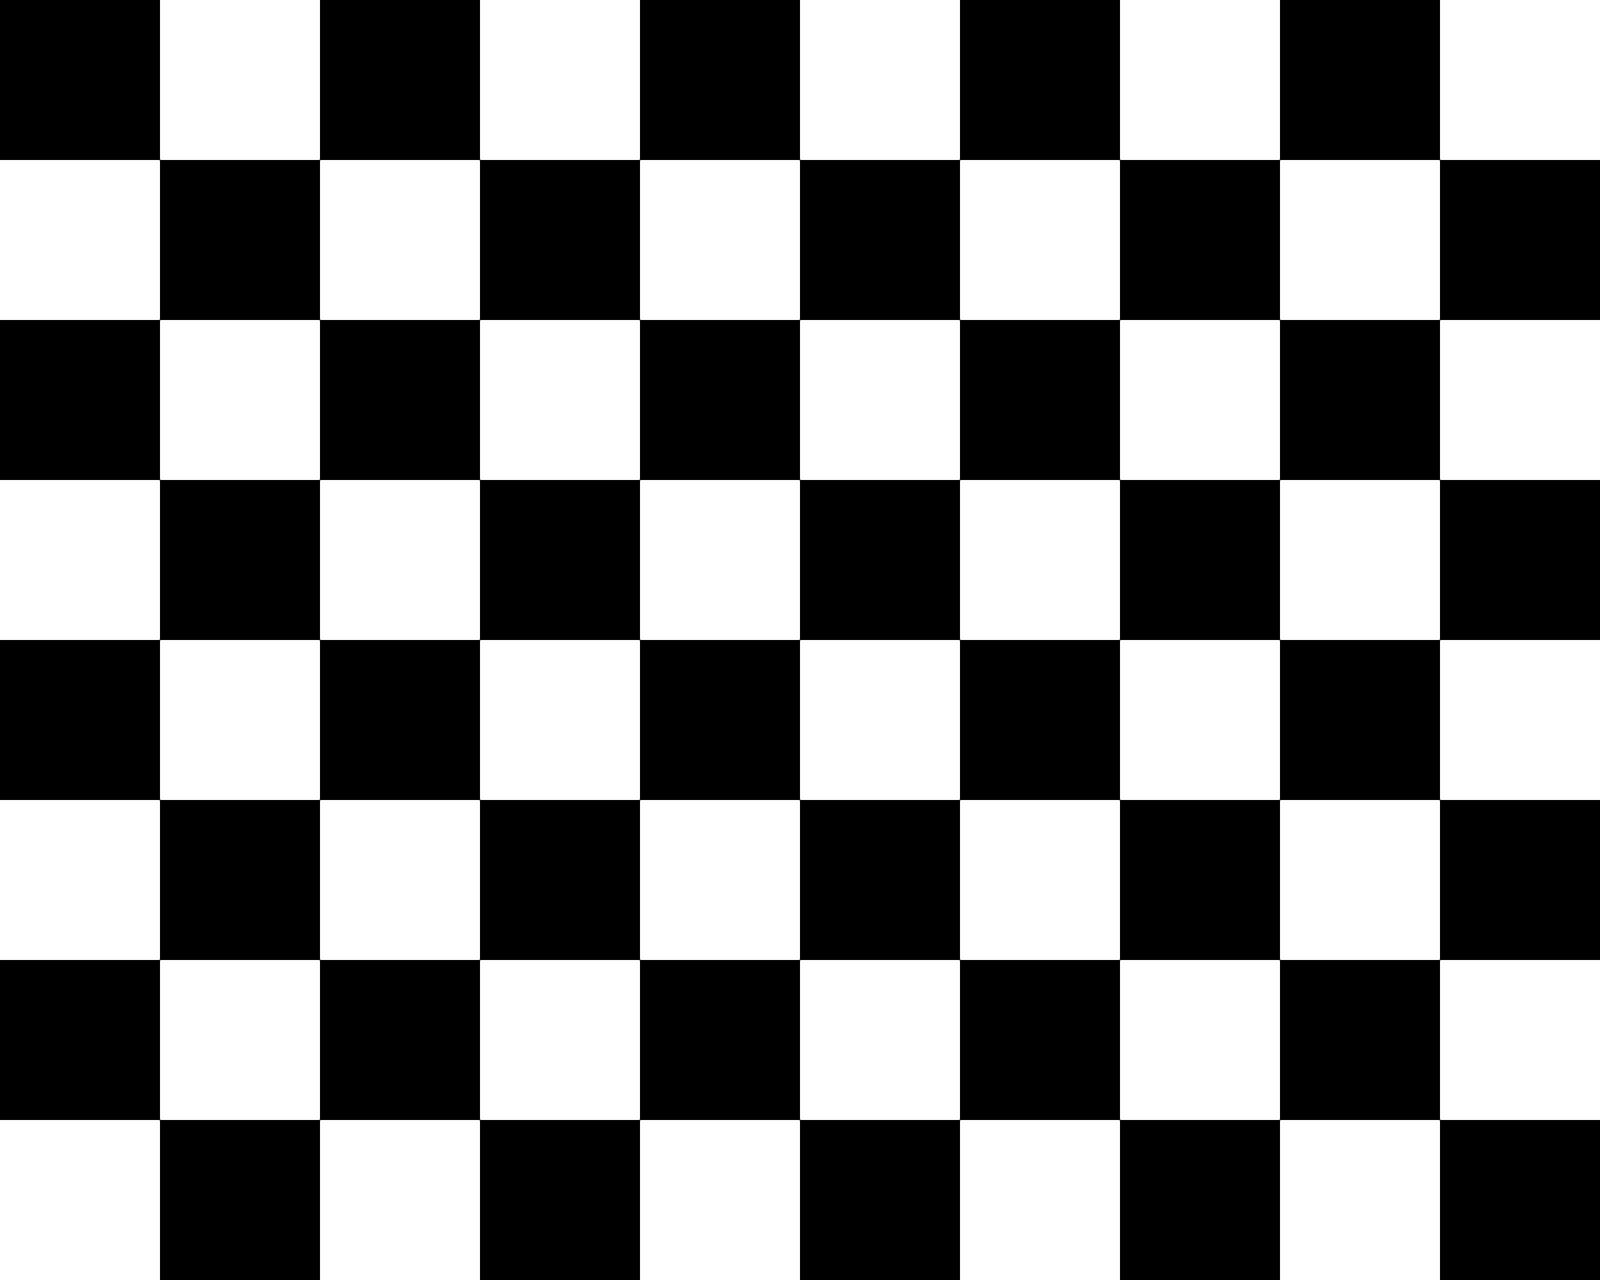 Checkered Flag Wallpaper Wallpapersafari